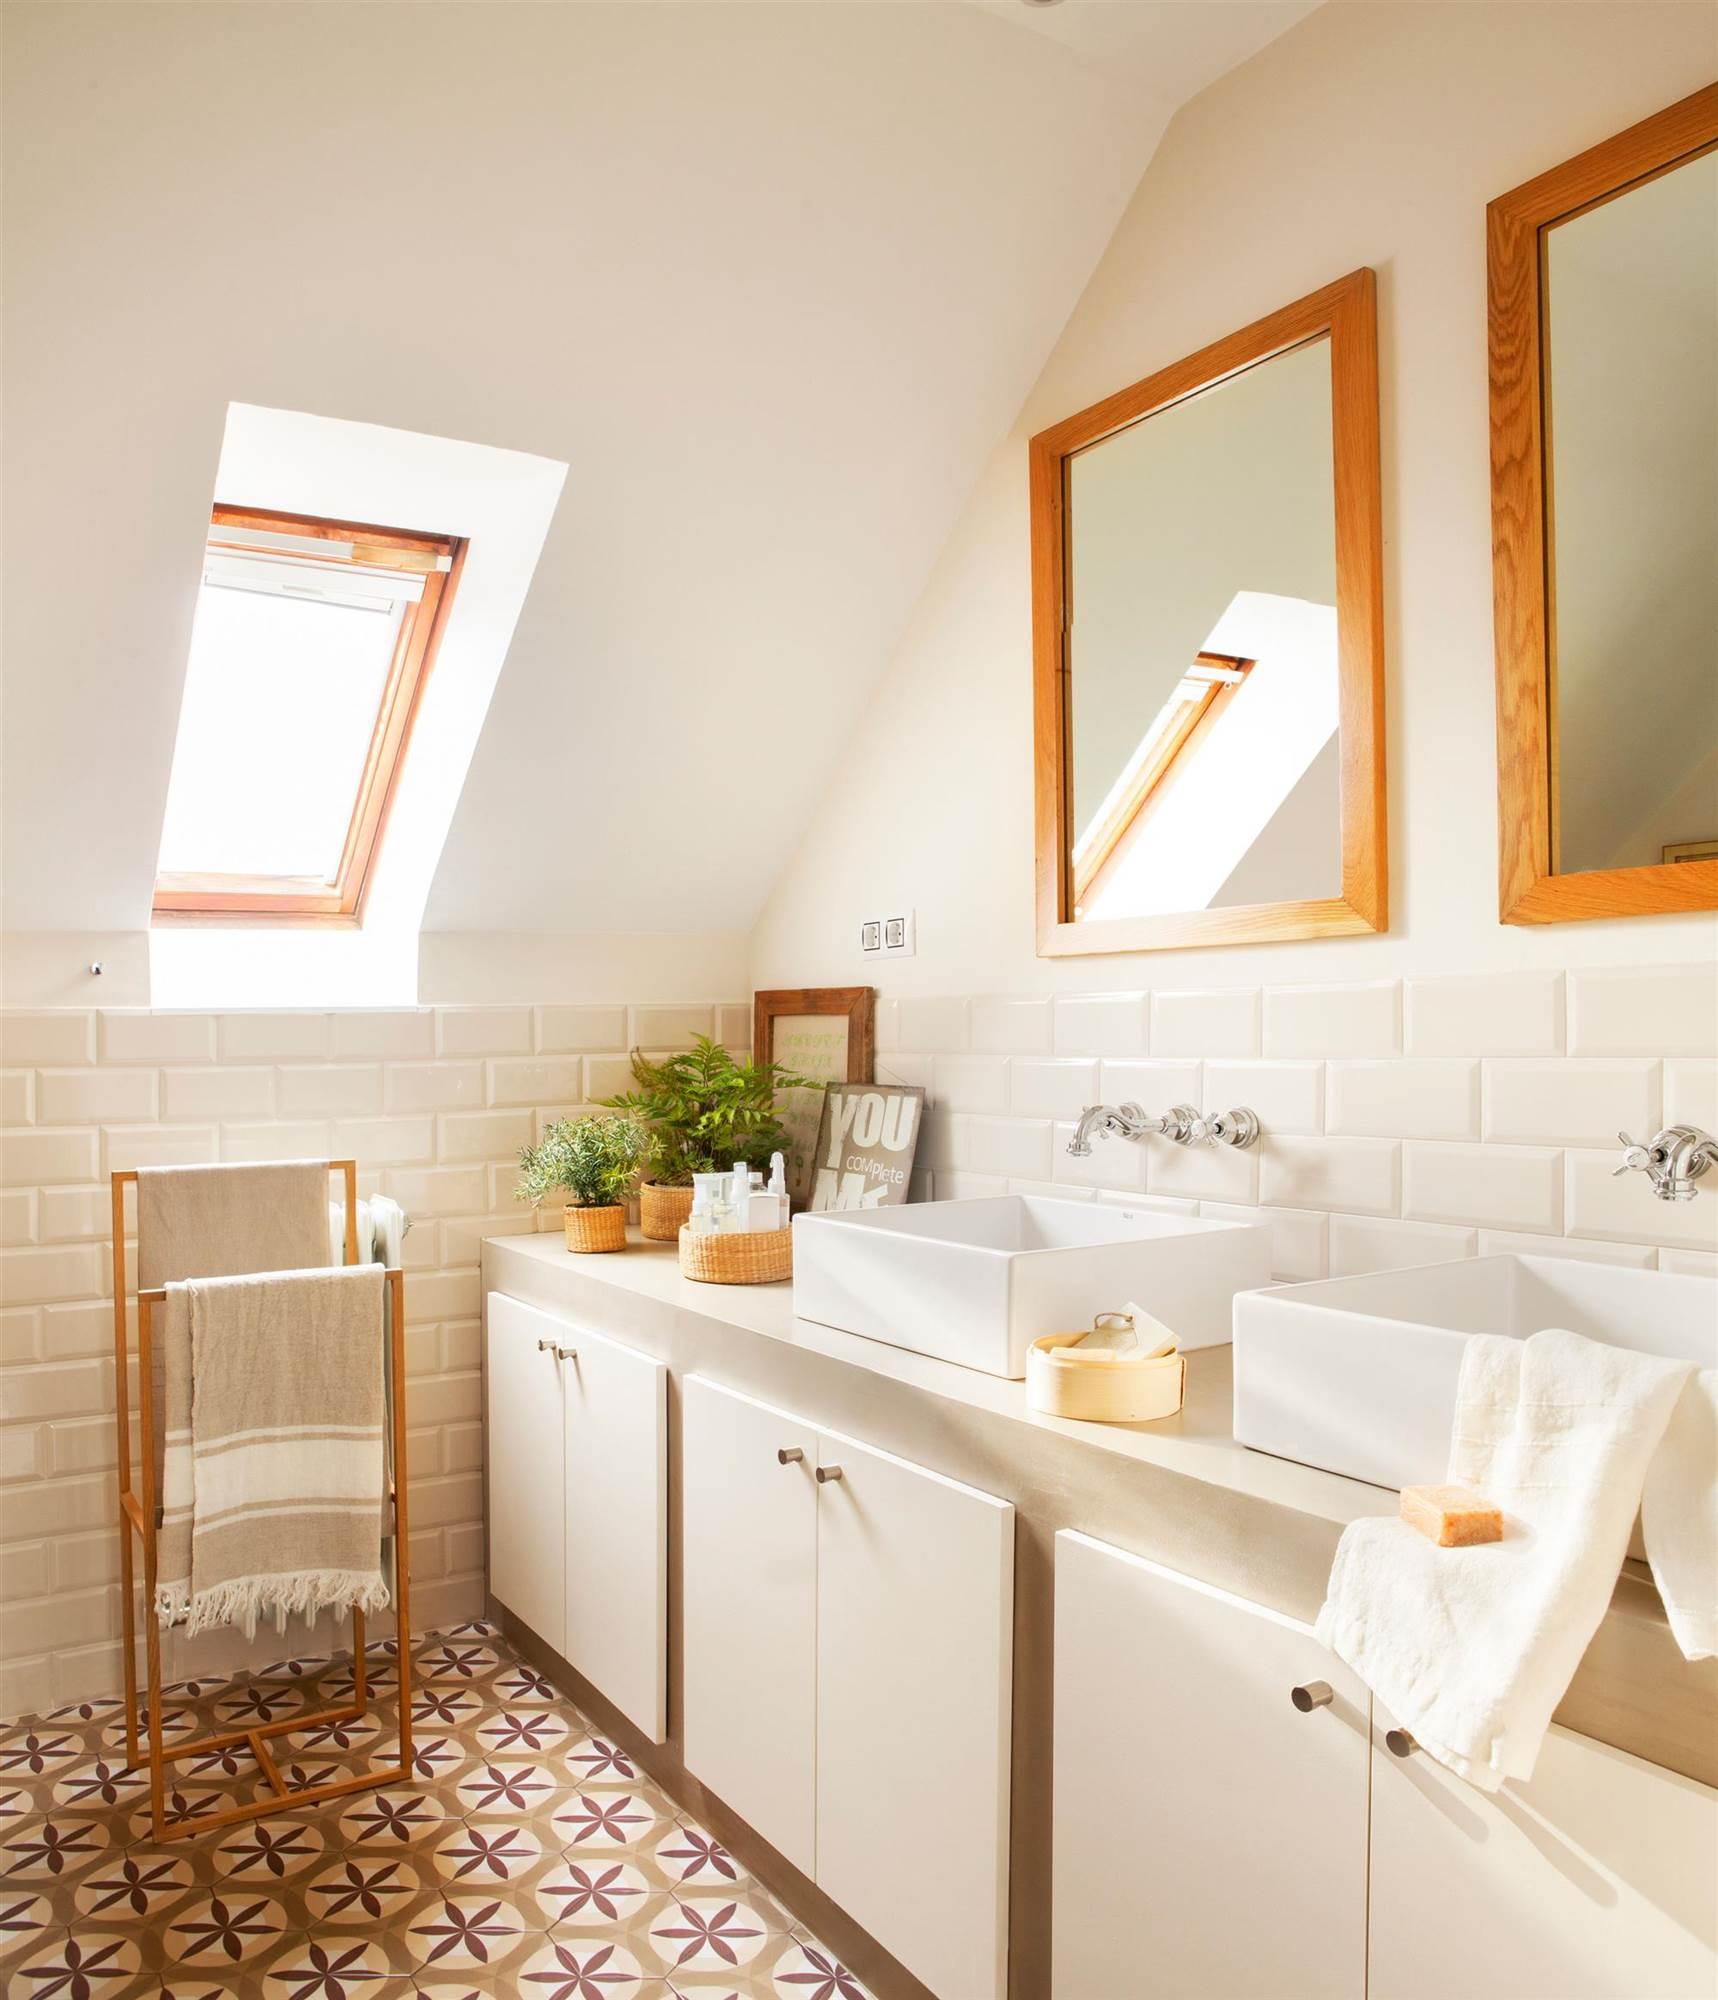 13 espacios decorados con baldosas tipo metro for Mueble ikea cuadrados